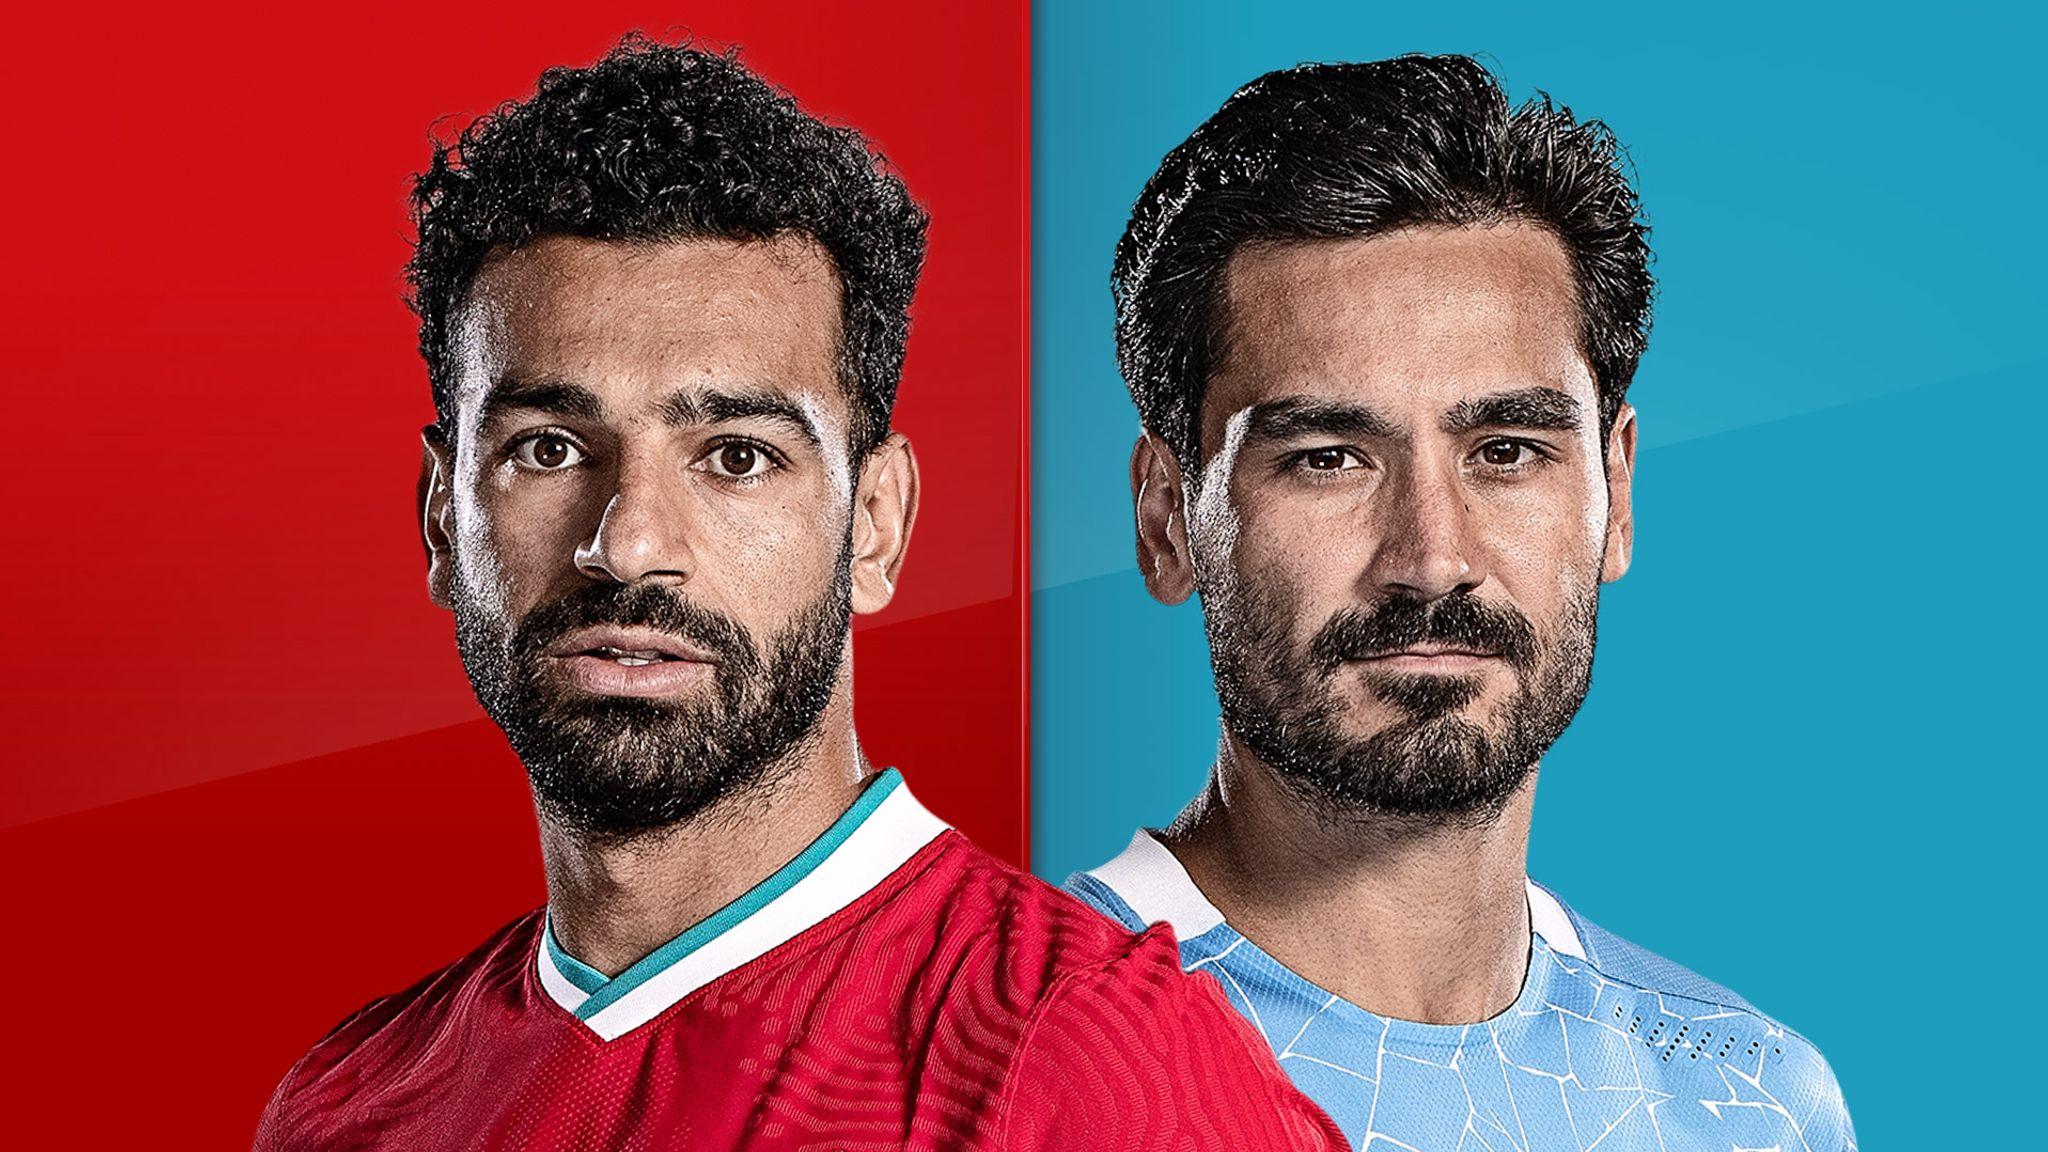 Salah (kiri) dan Gundogan menjadi pemain yang paling ditunggu Liverpool dan Man City dalam kompetisi putaran 22 Premier League hari ini 7/2.